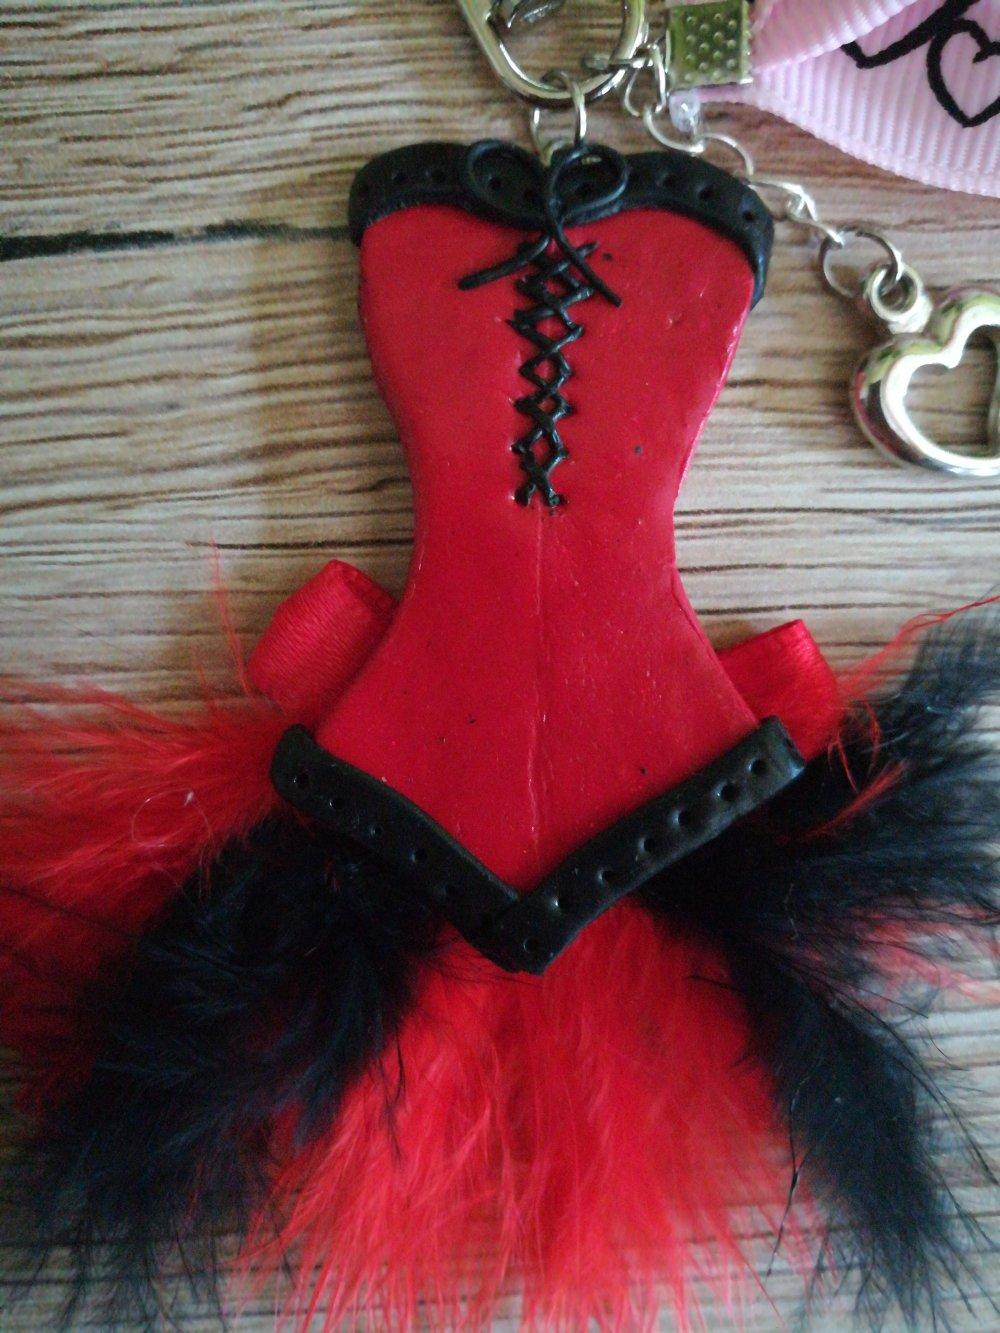 Bijou de sac robe corset